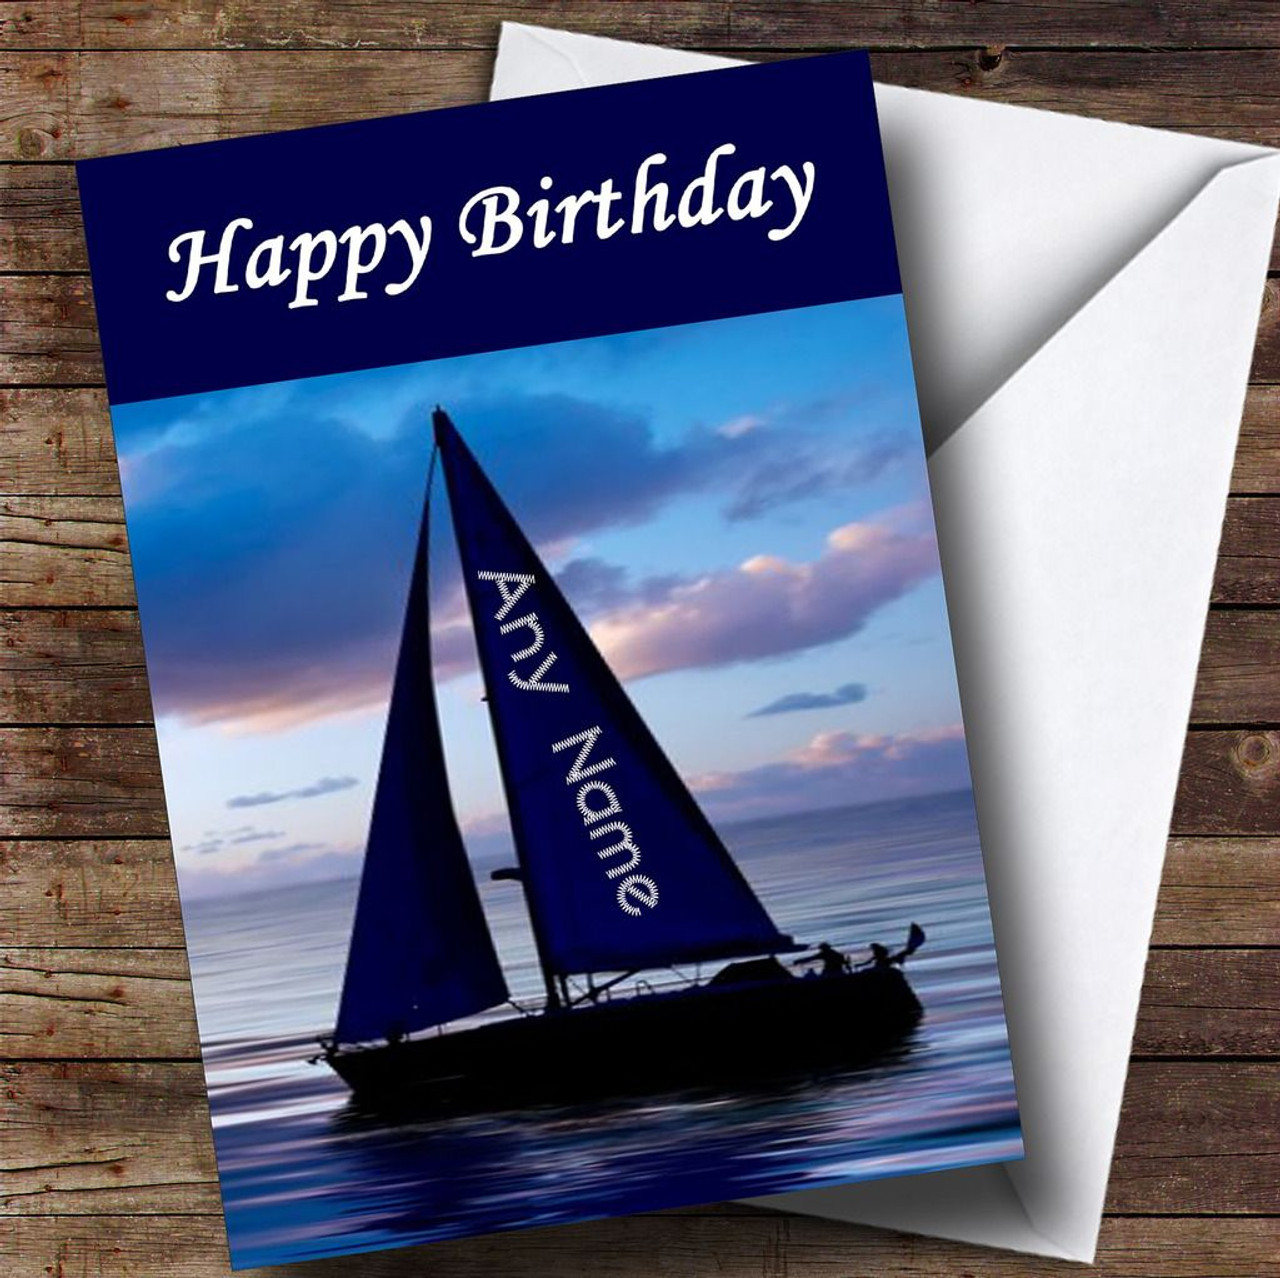 Sailing Boat Name On Sail Funny Personalised Birthday Card